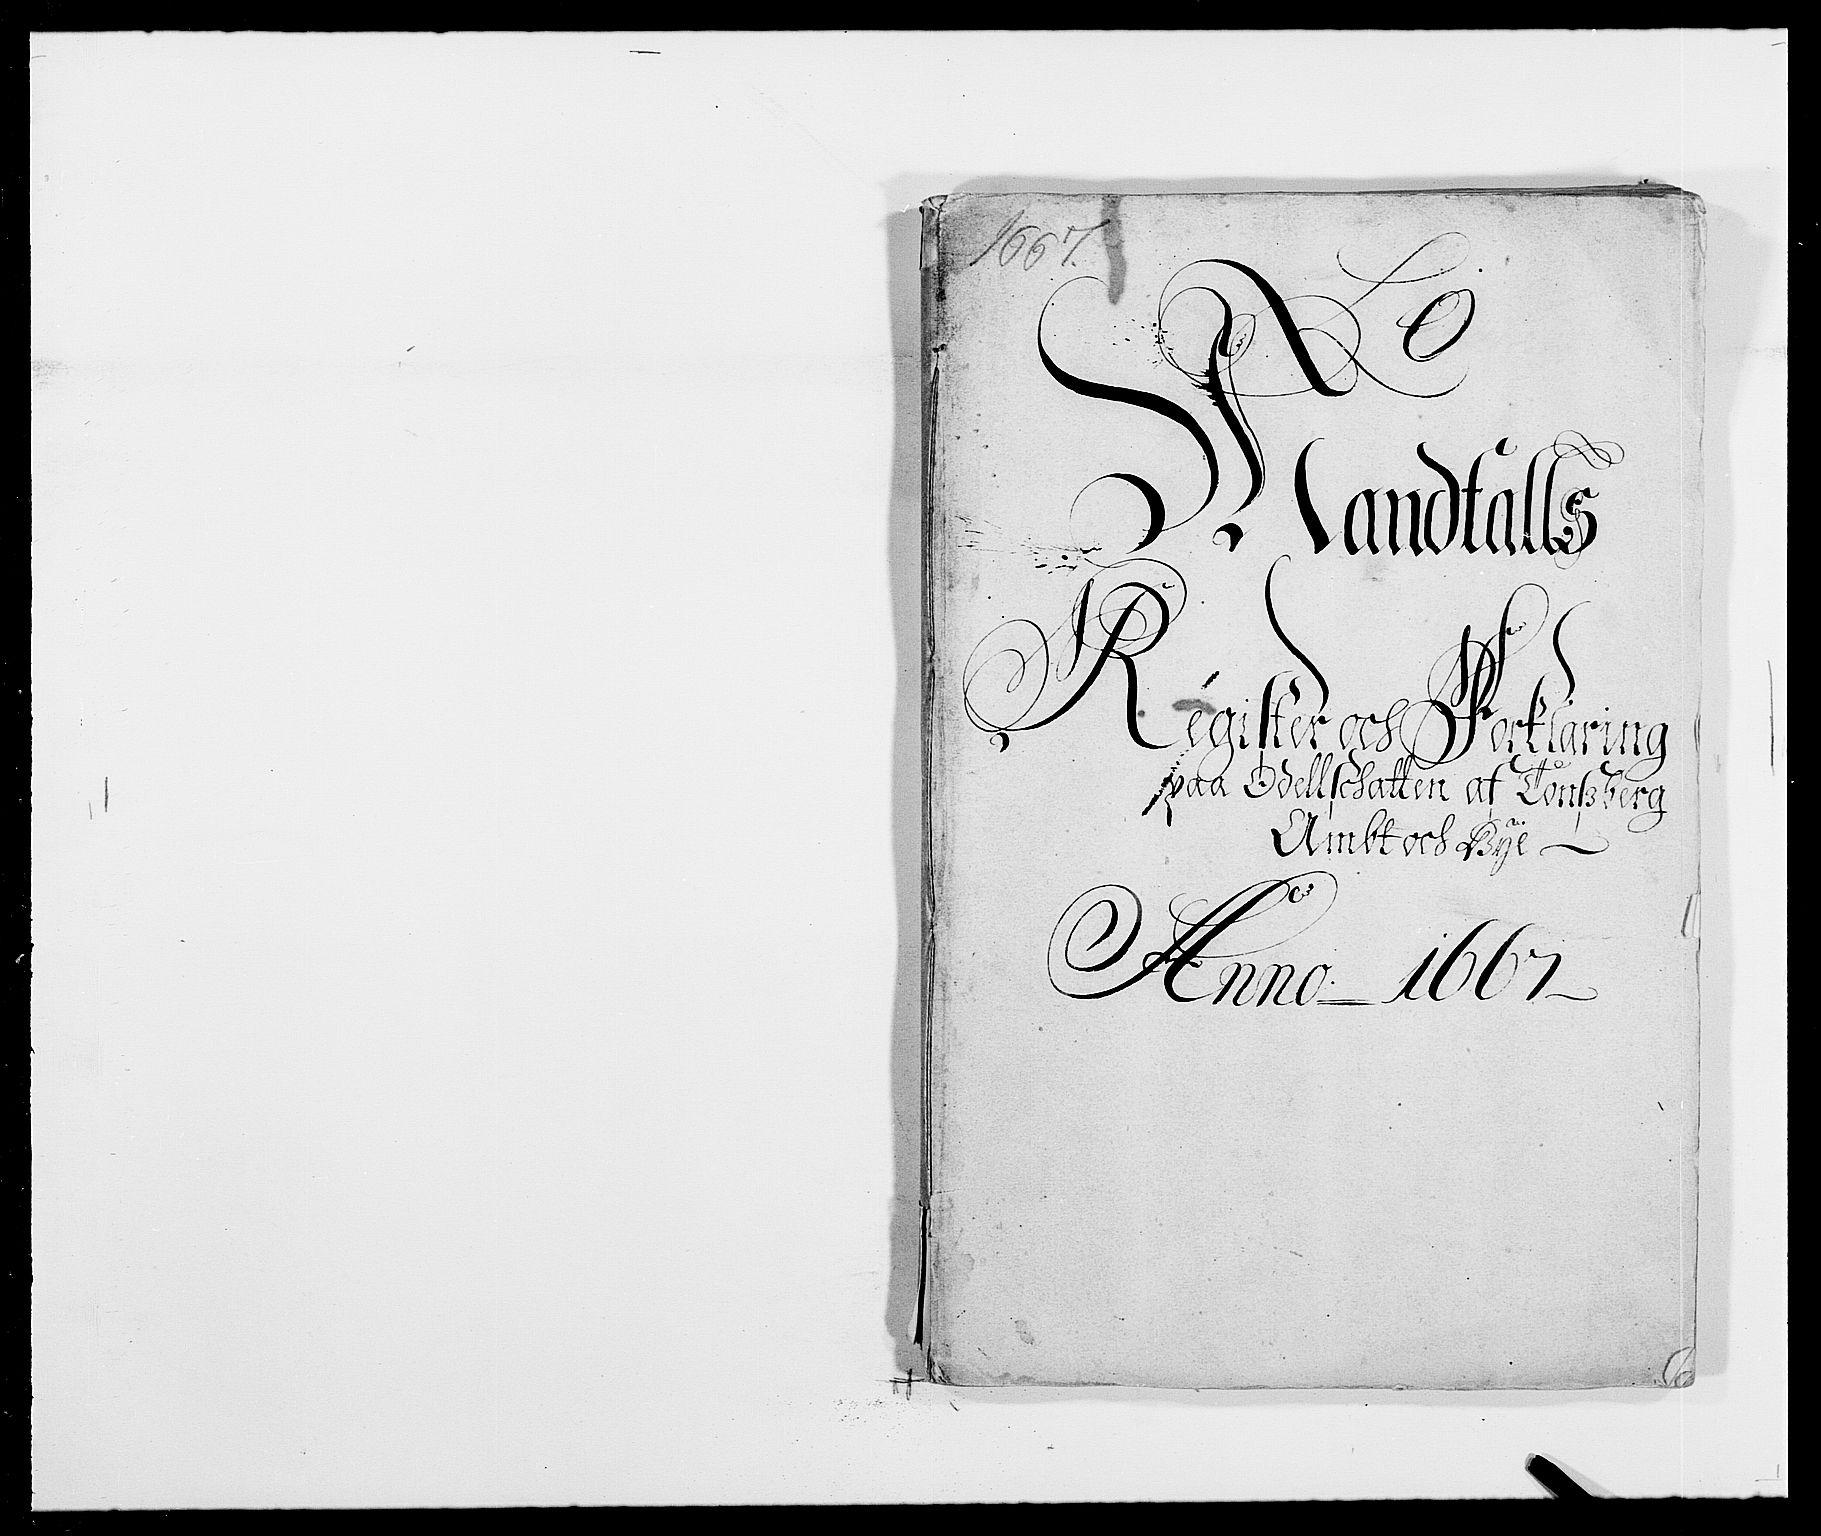 RA, Rentekammeret inntil 1814, Reviderte regnskaper, Fogderegnskap, R32/L1840: Fogderegnskap Jarlsberg grevskap, 1664-1673, s. 64